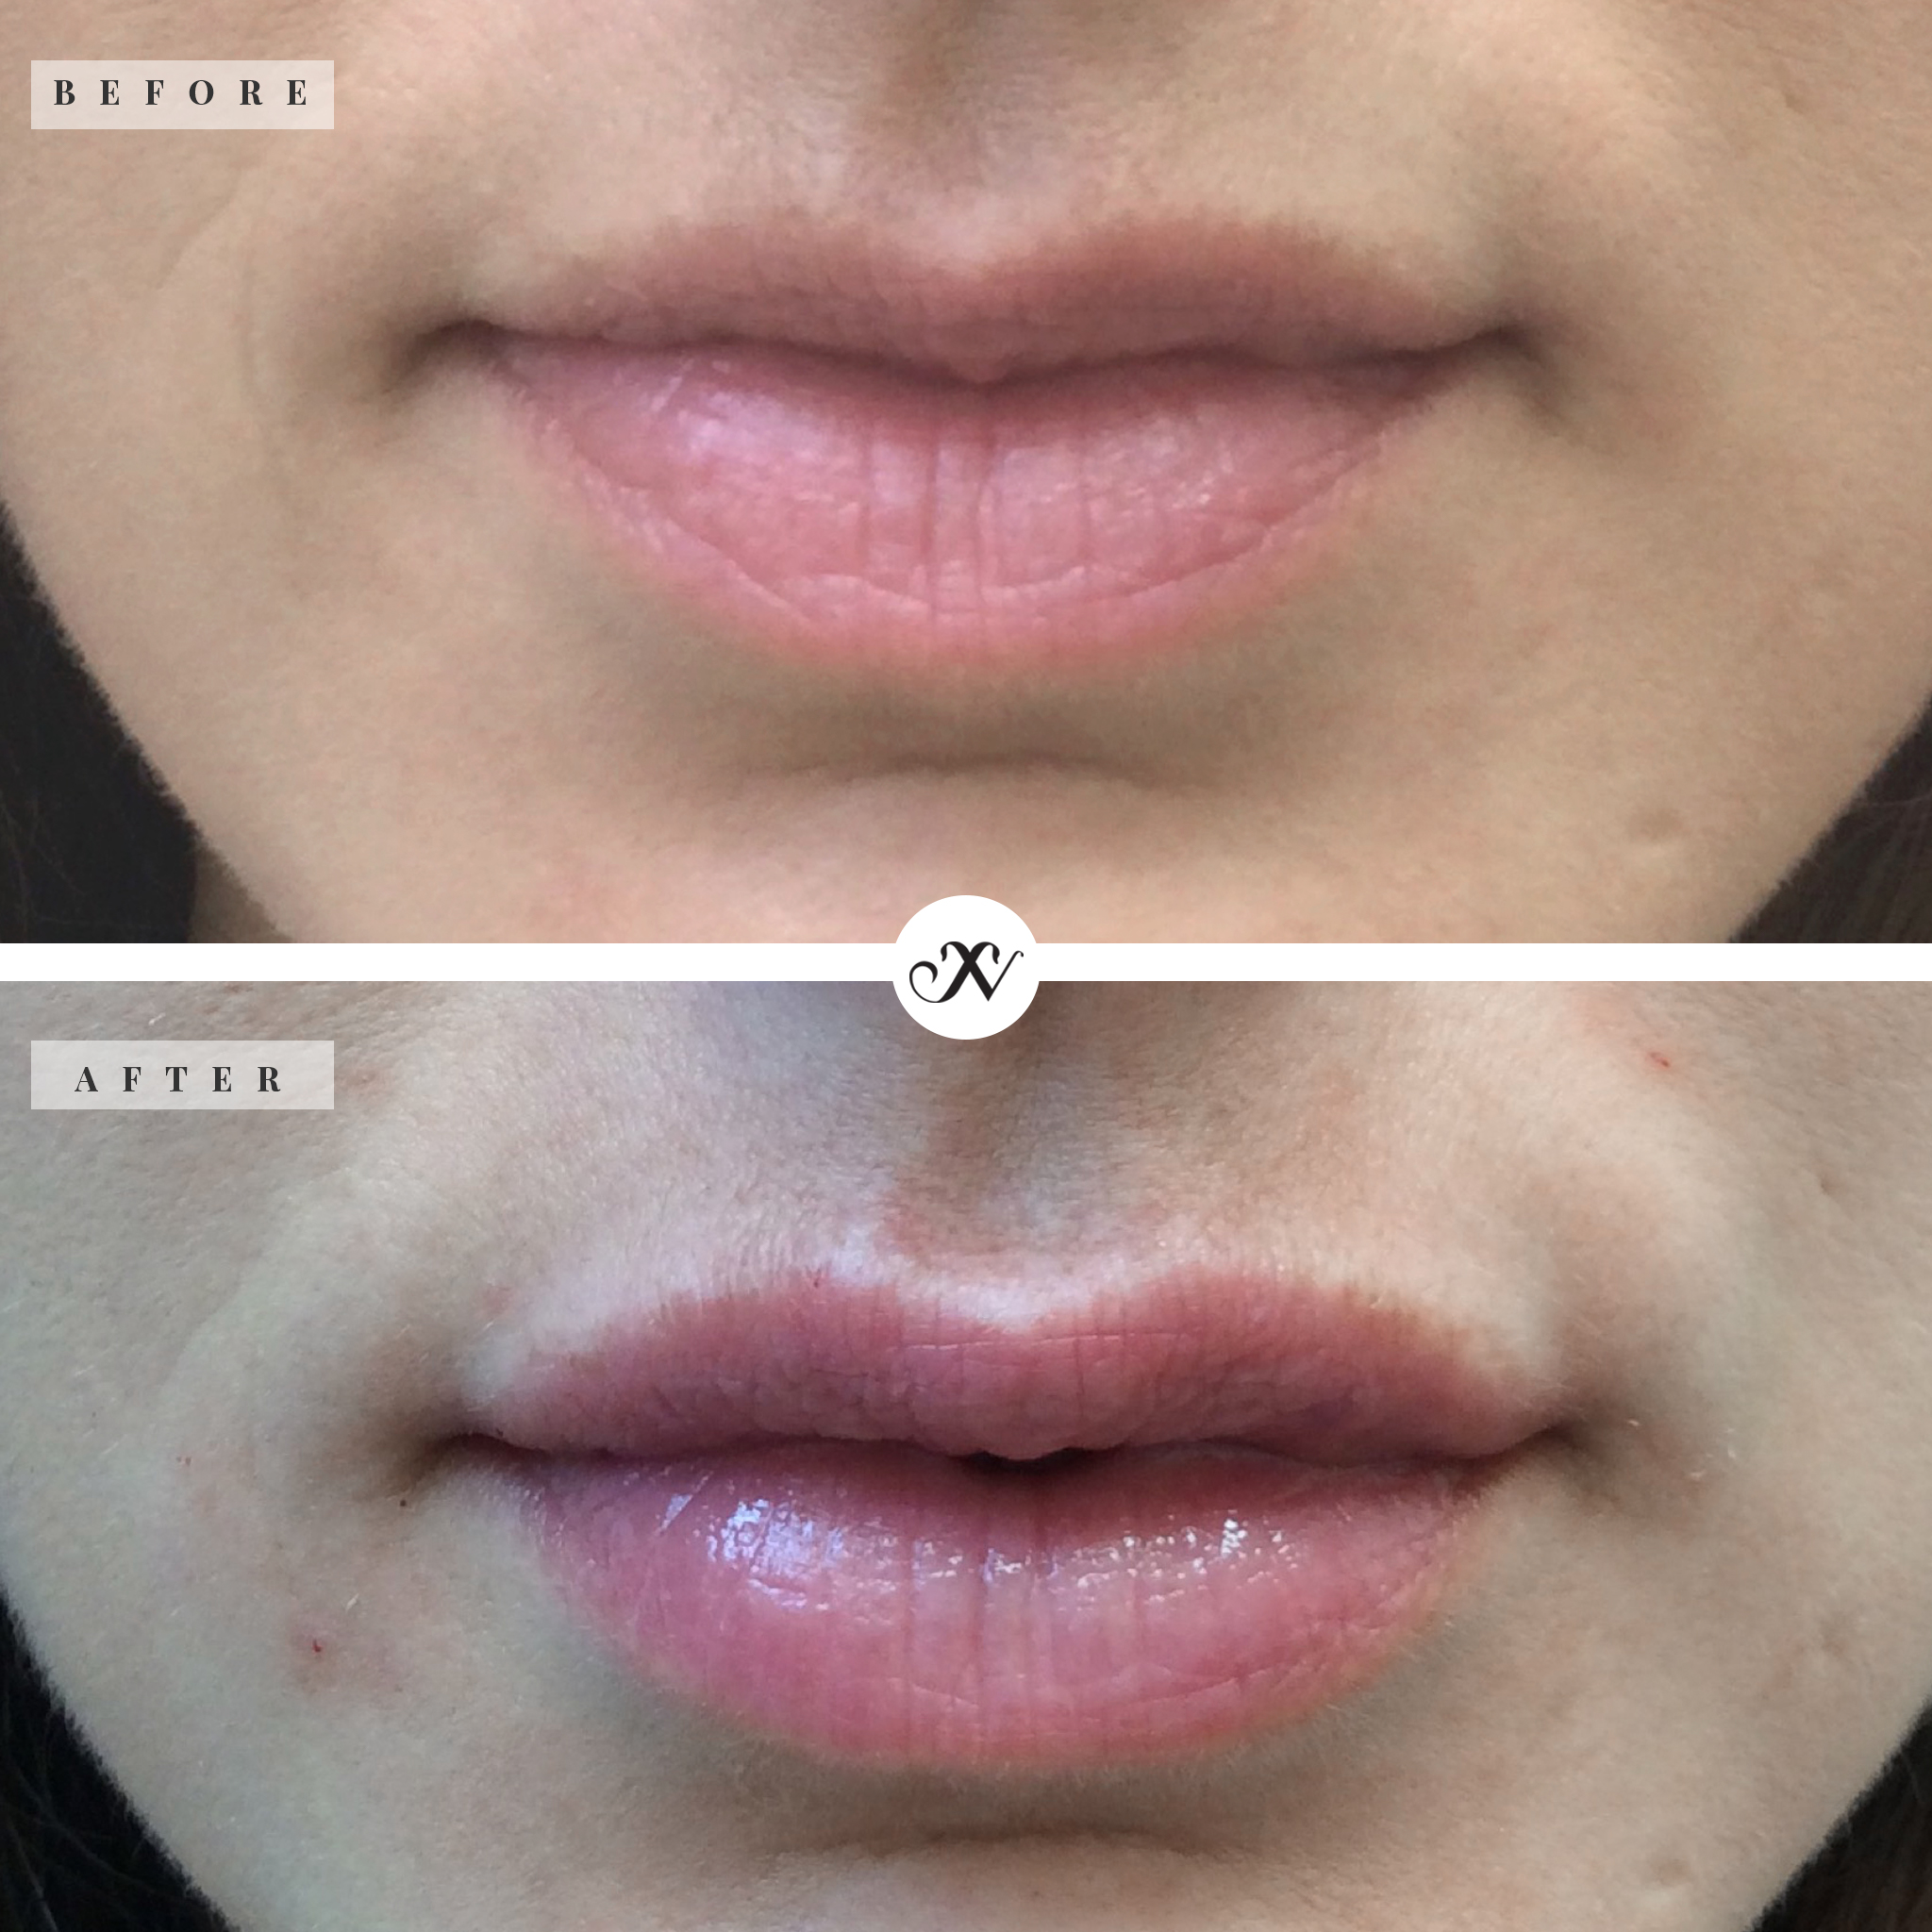 Lips_square_B&A_website2.jpg